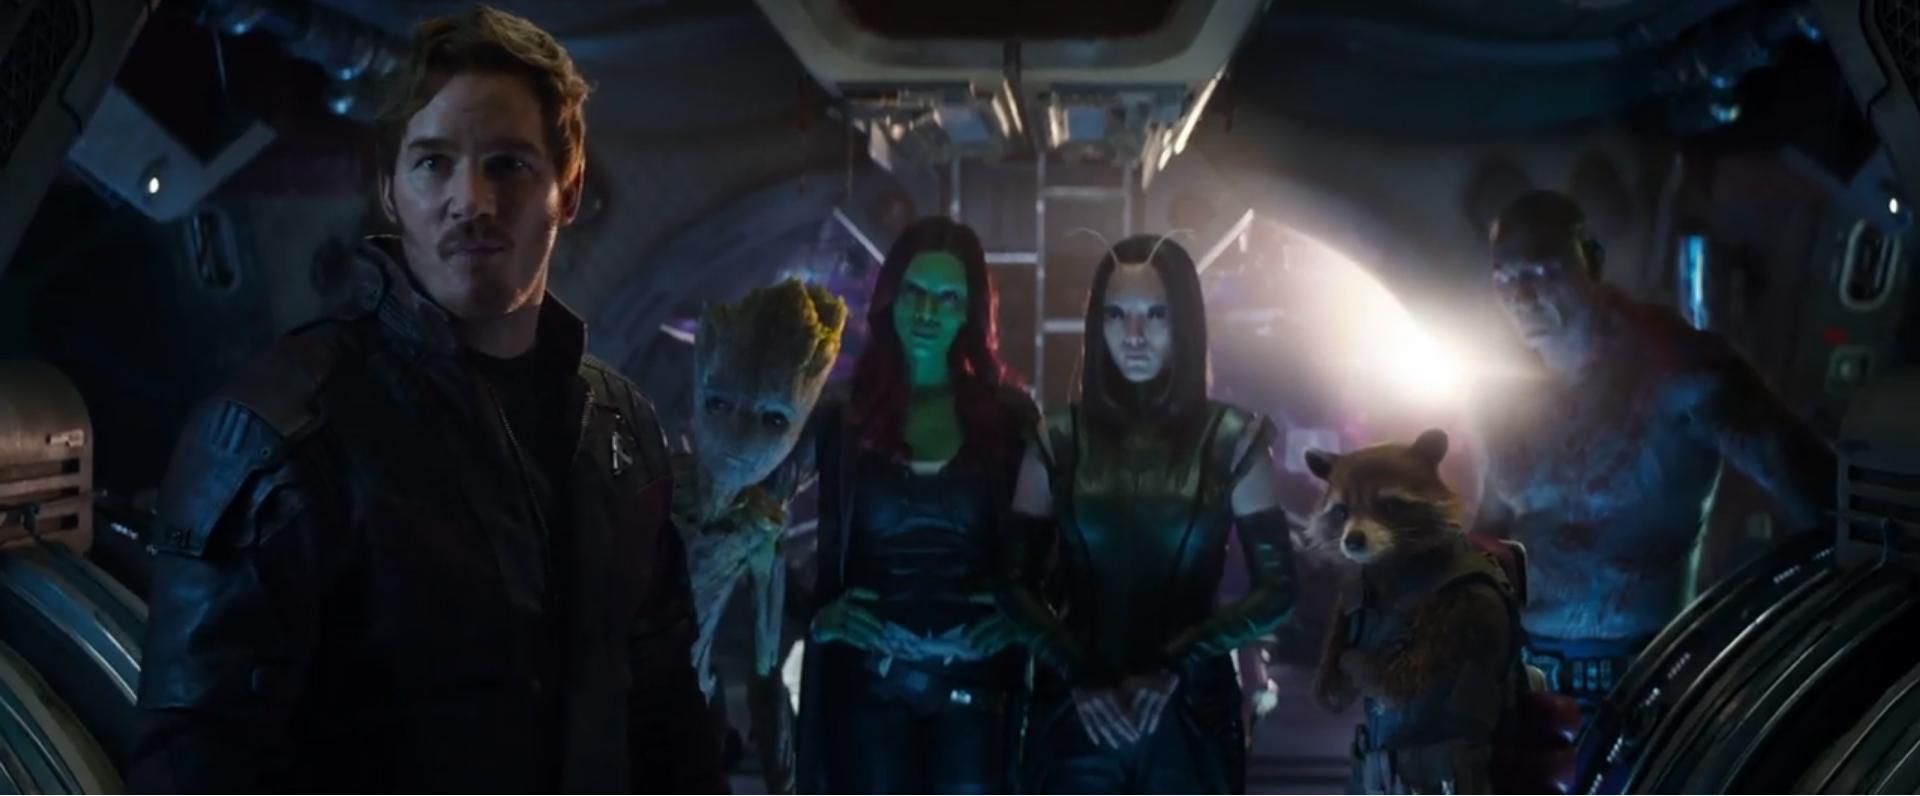 Avengers: Infinity War screenwriter confirms major Marvel